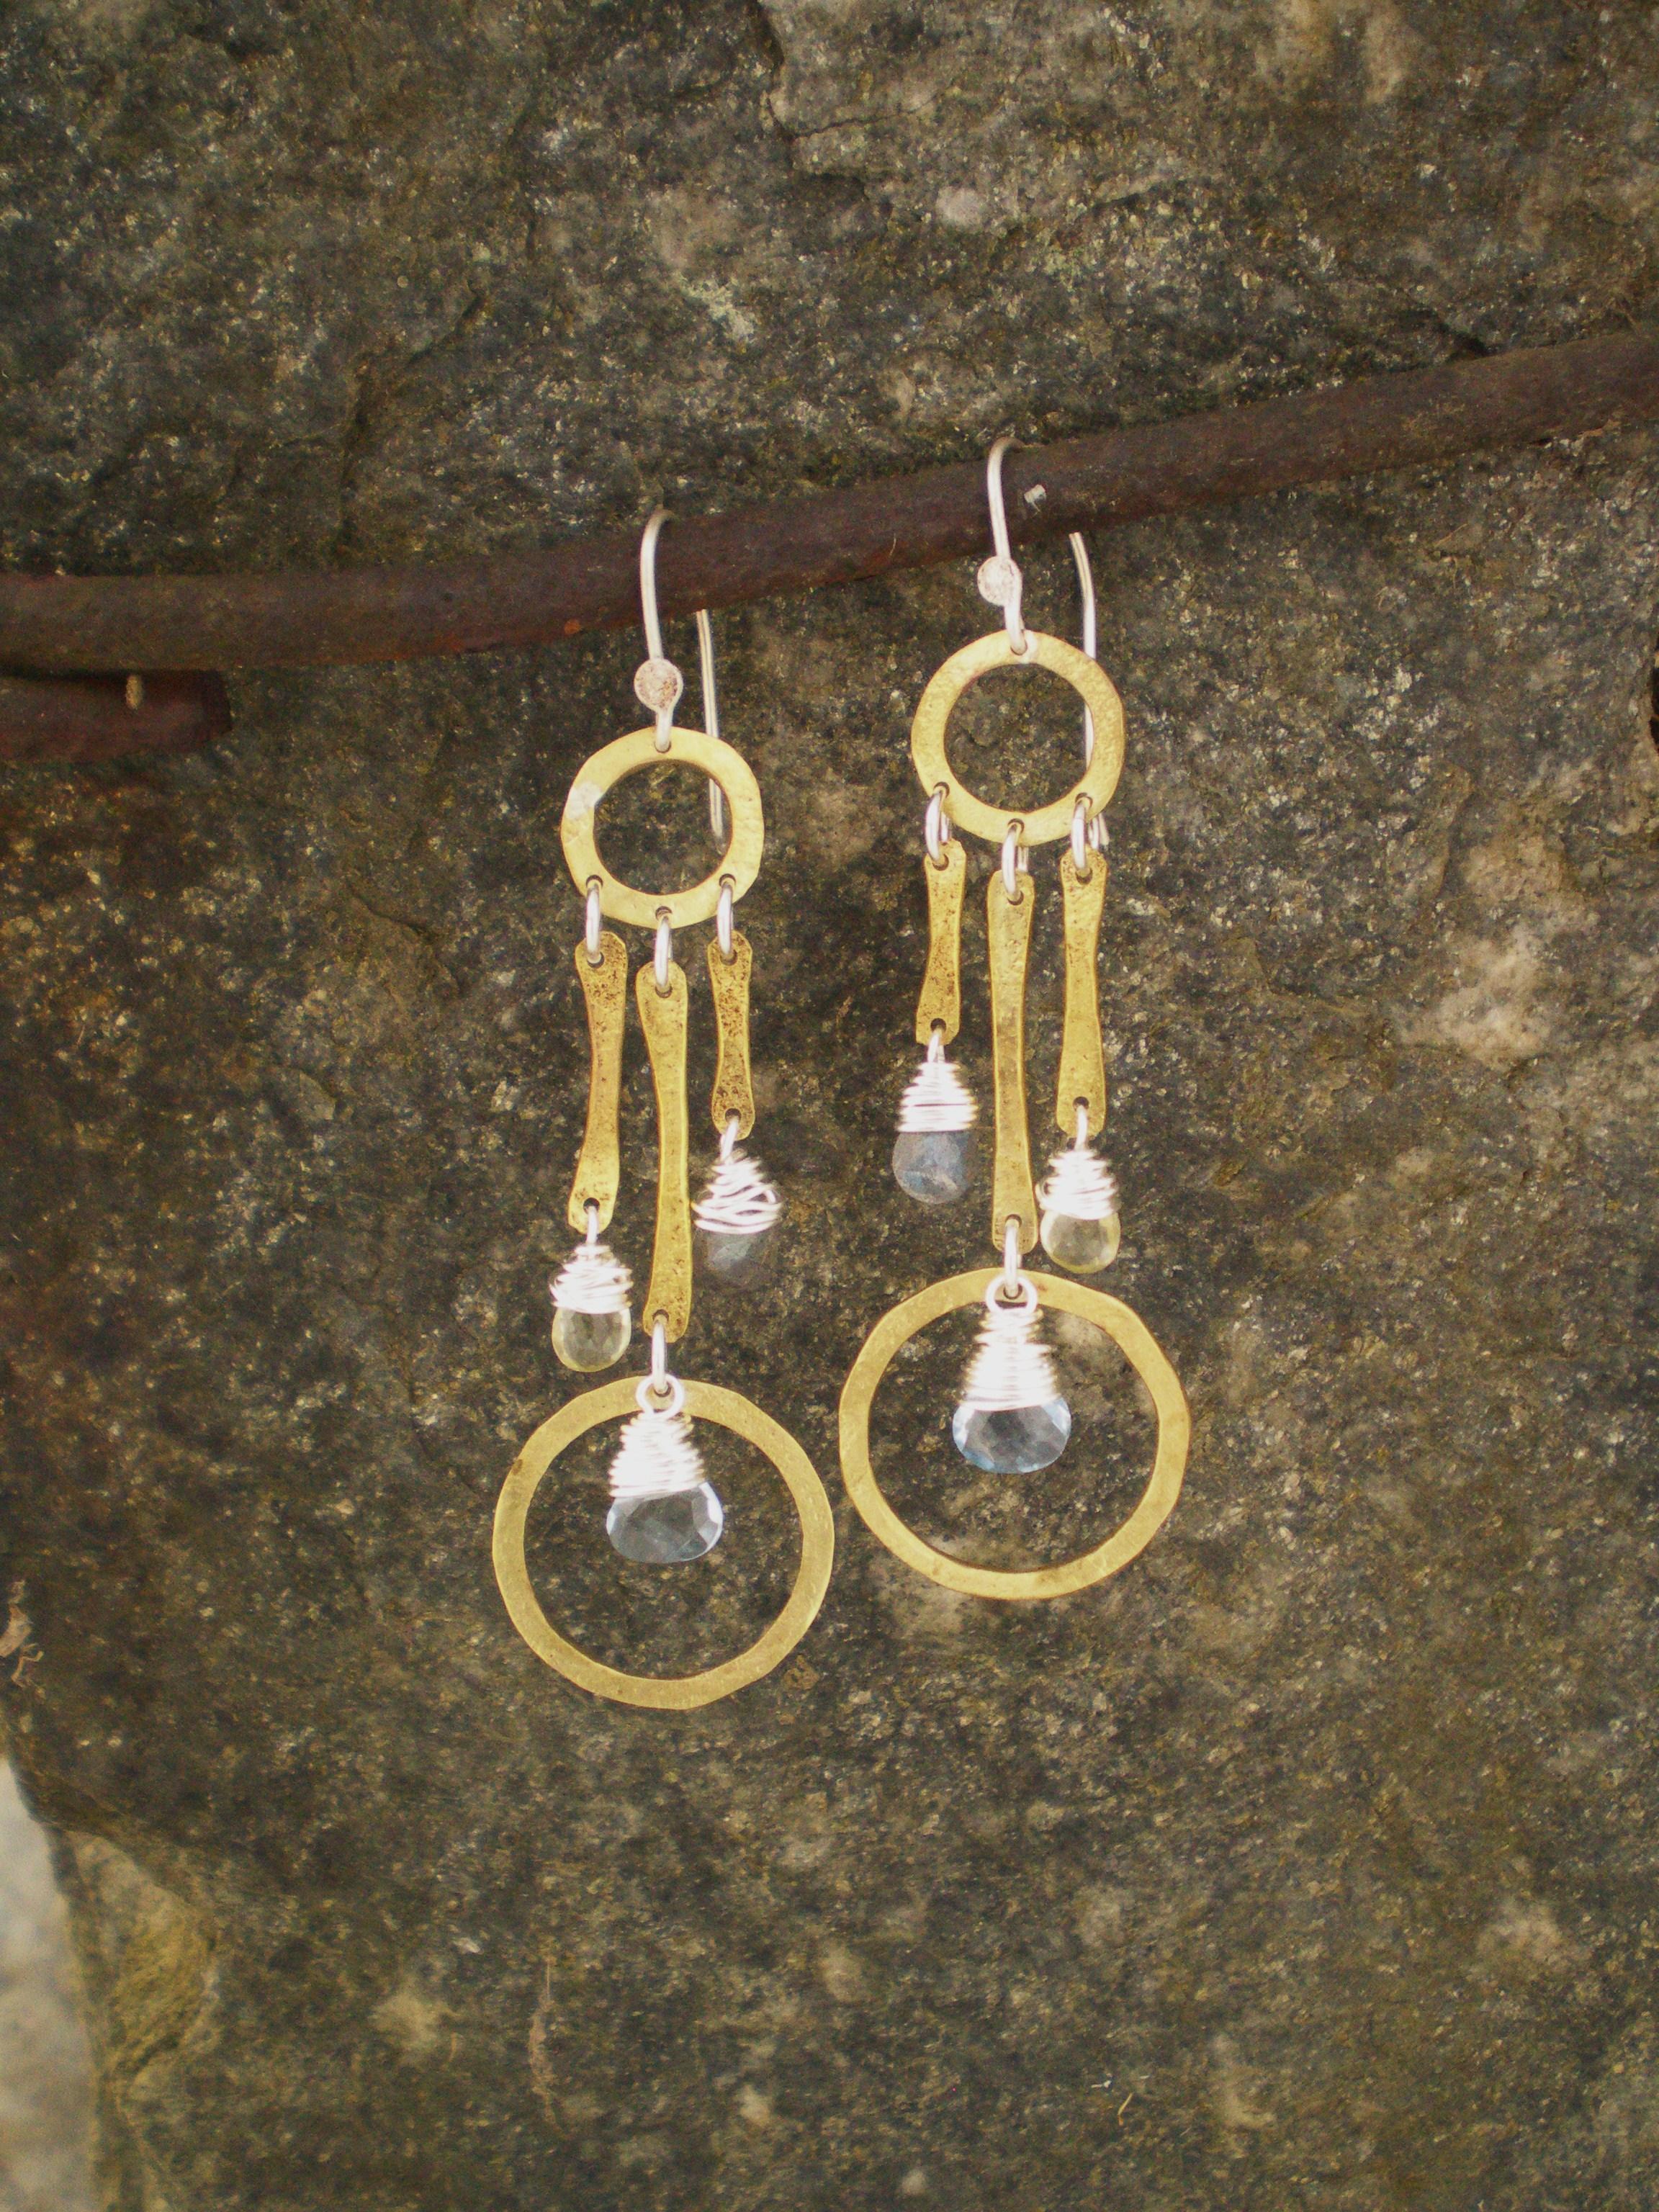 Dreamcatcher Earring  : Brass 'bones' with sterling silver accents. Labradorite, citrine & blue crystal gemstones.